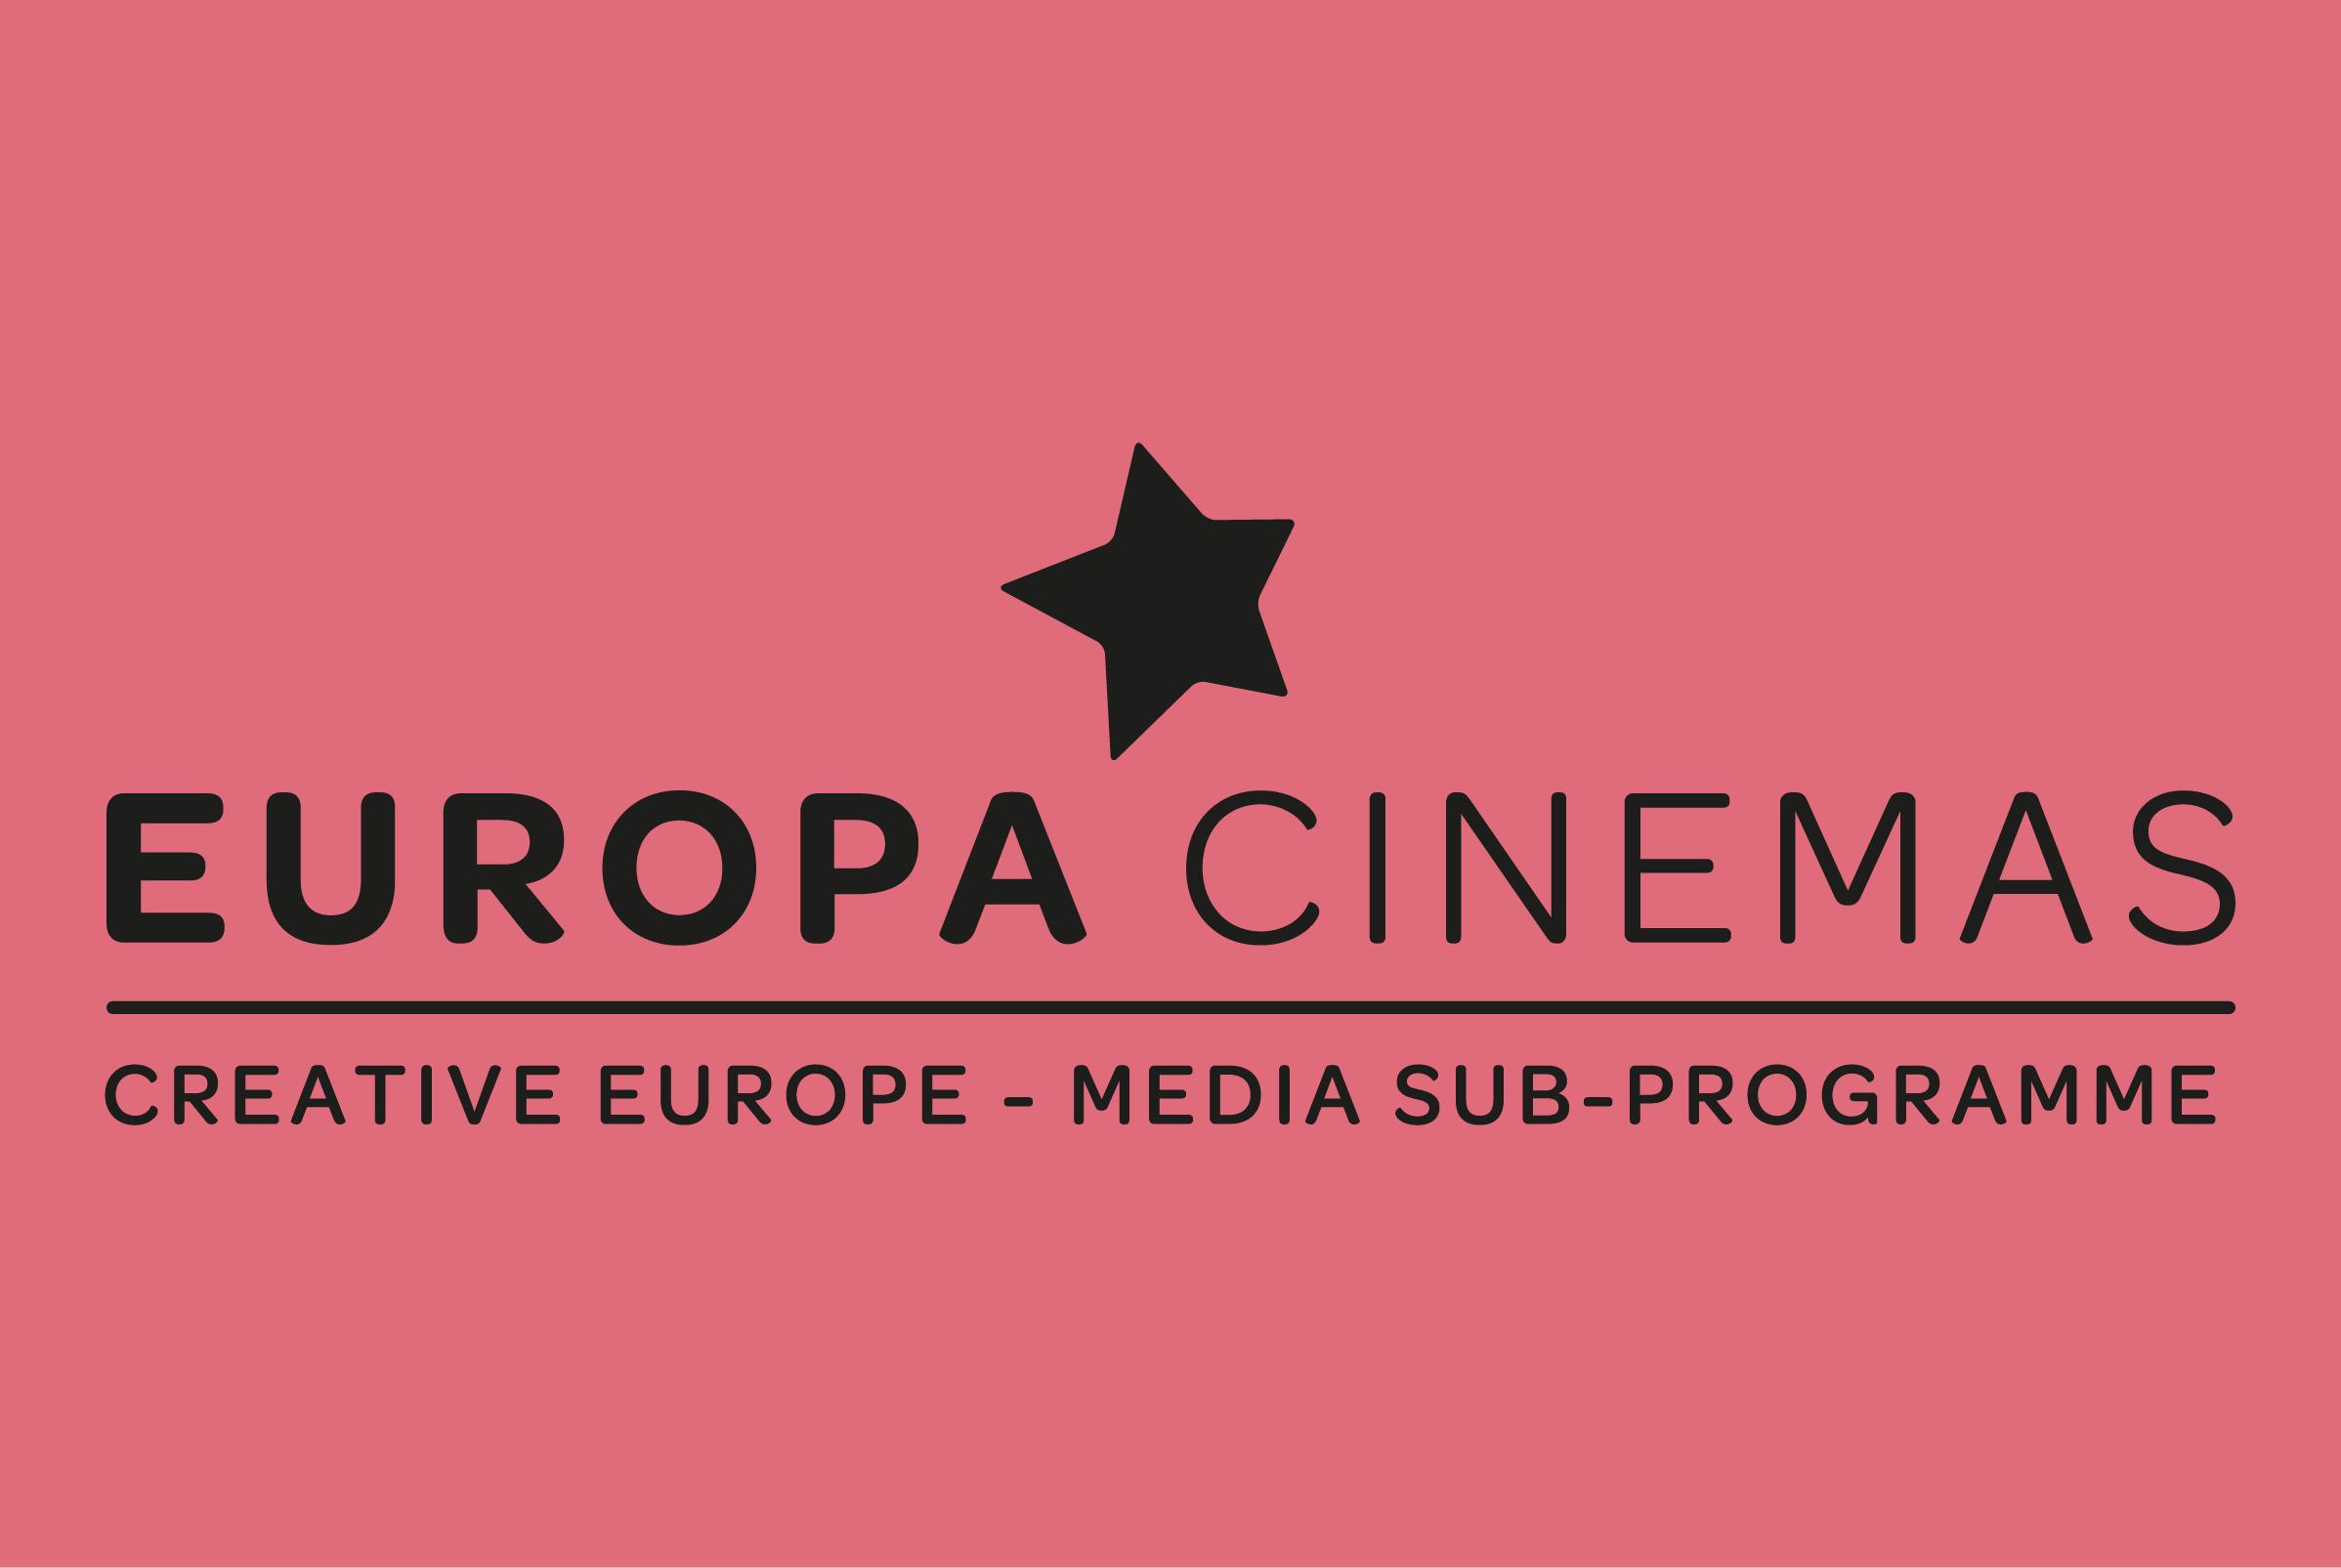 EUROPA CINEMAS